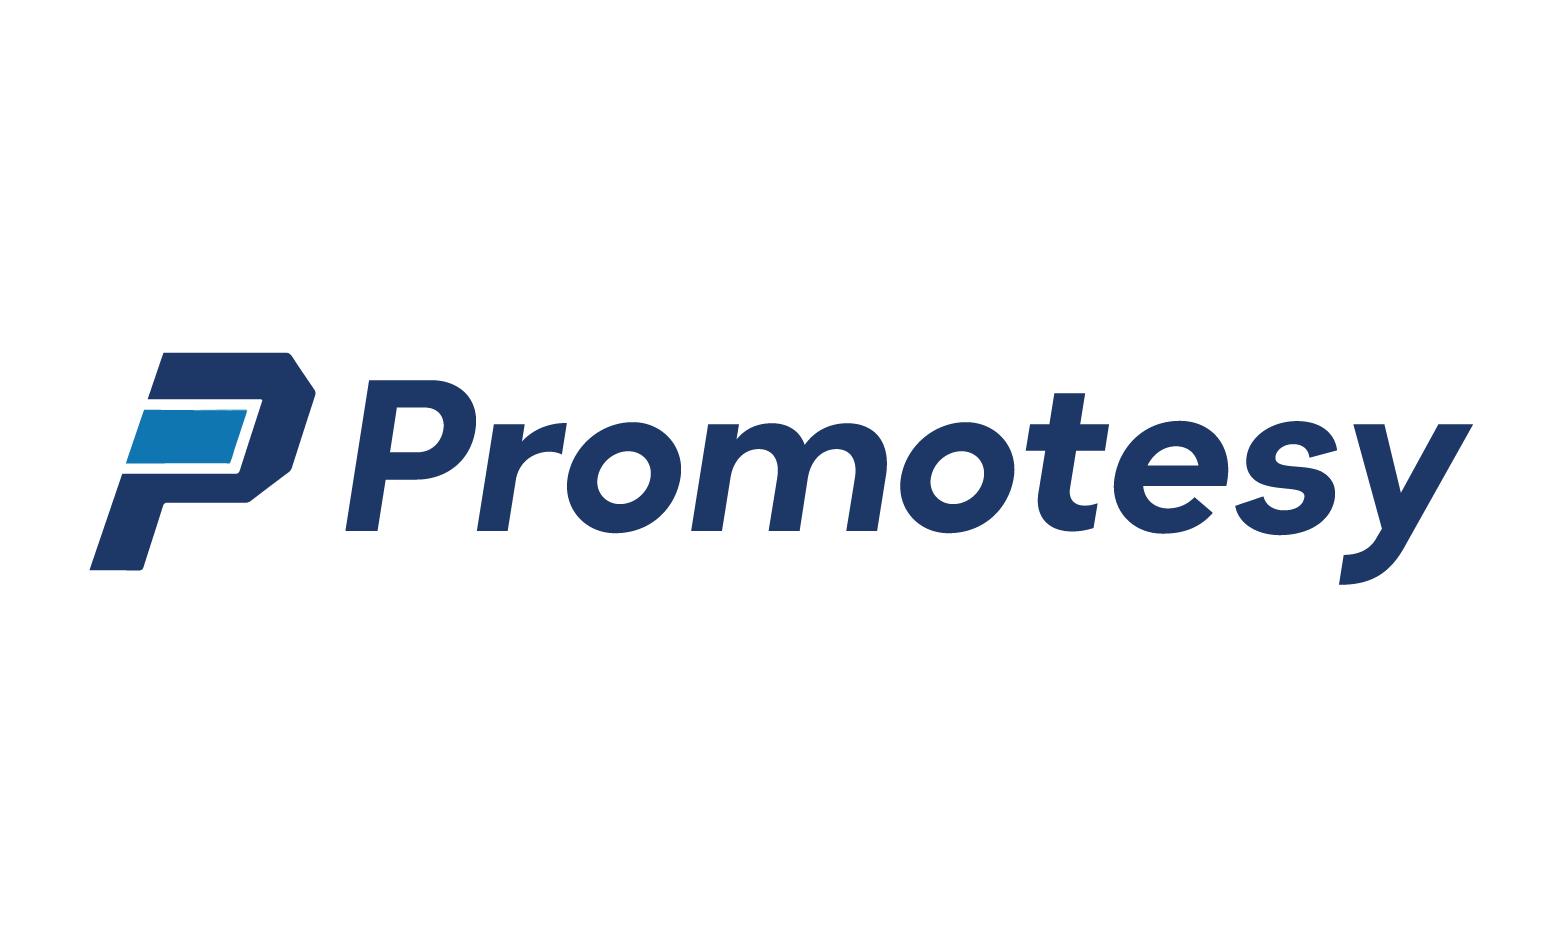 Promotesy.com